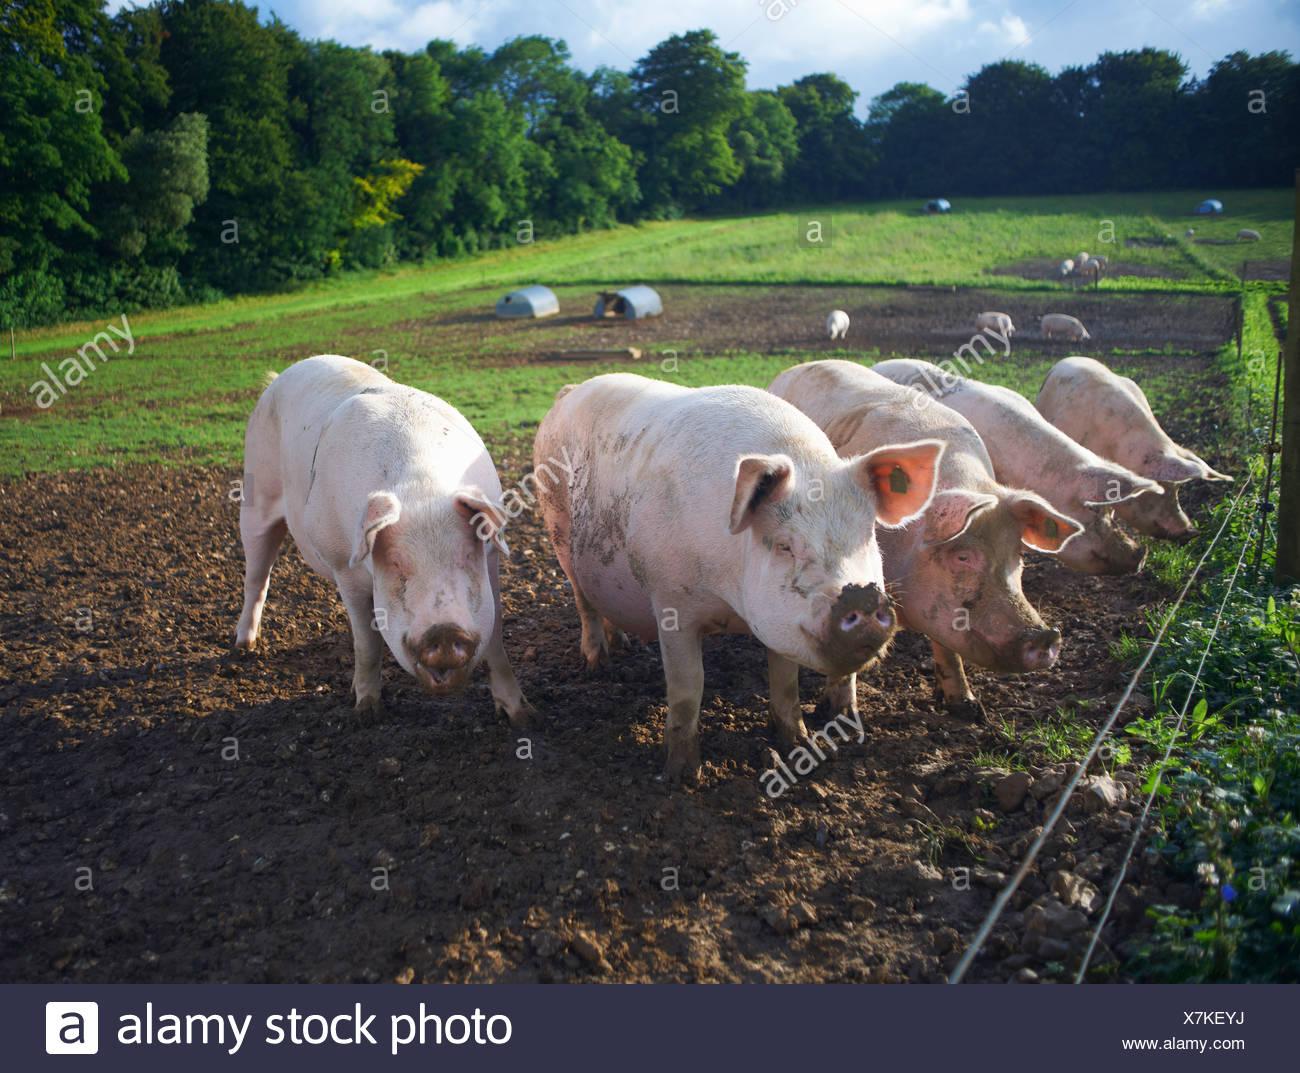 Pigs rooting in dirt field - Stock Image